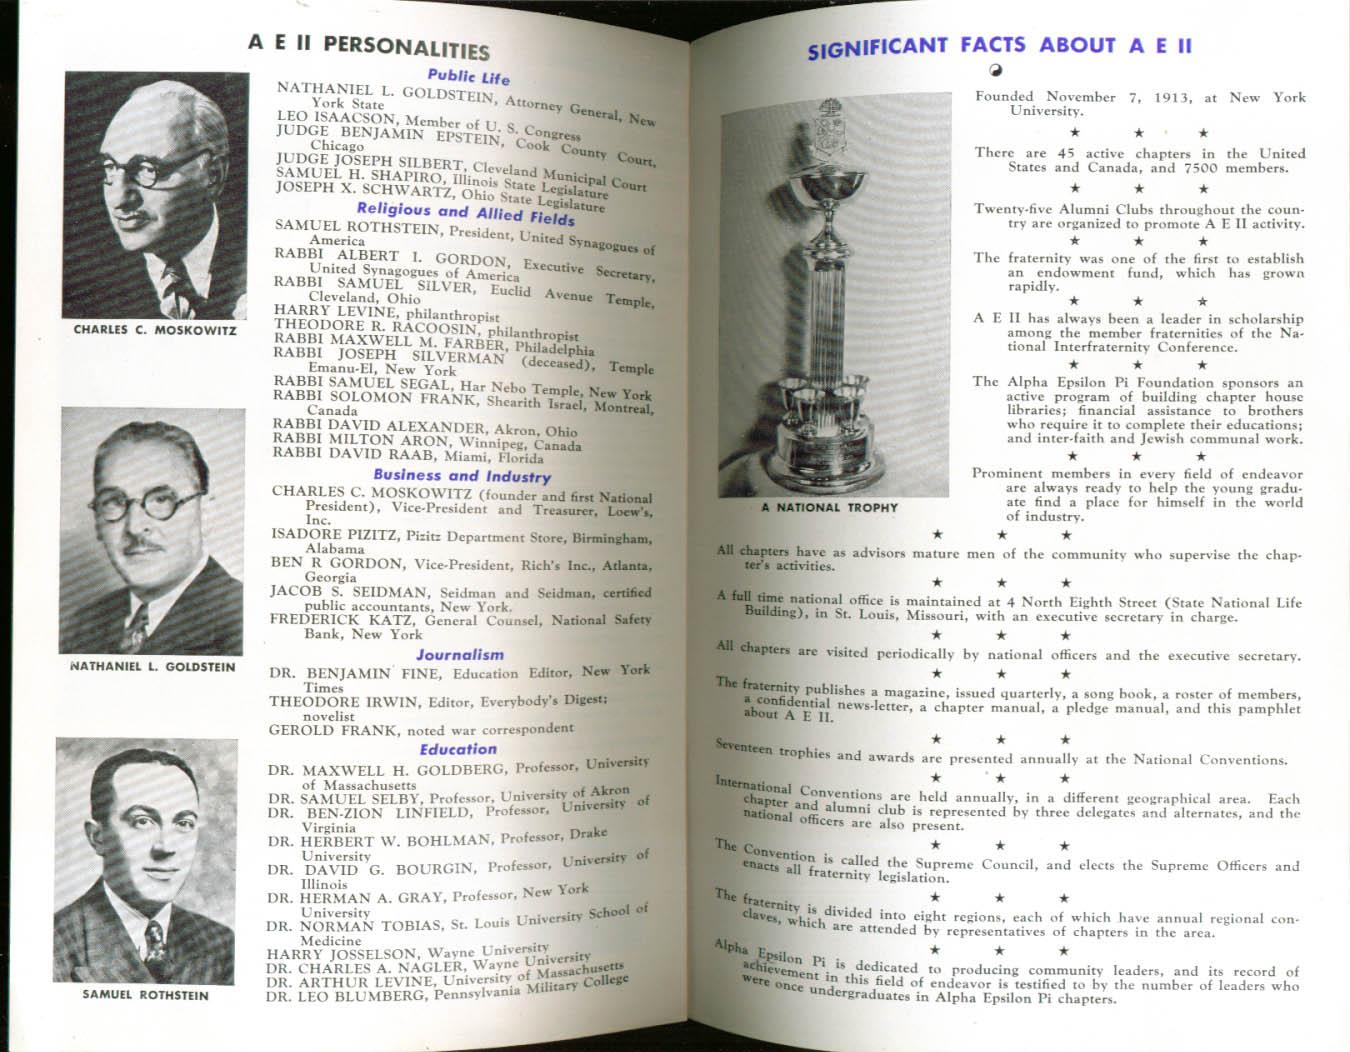 Alpha Epsilon Pi Fraternity Facts booklet University of Pennsylvania 1940s